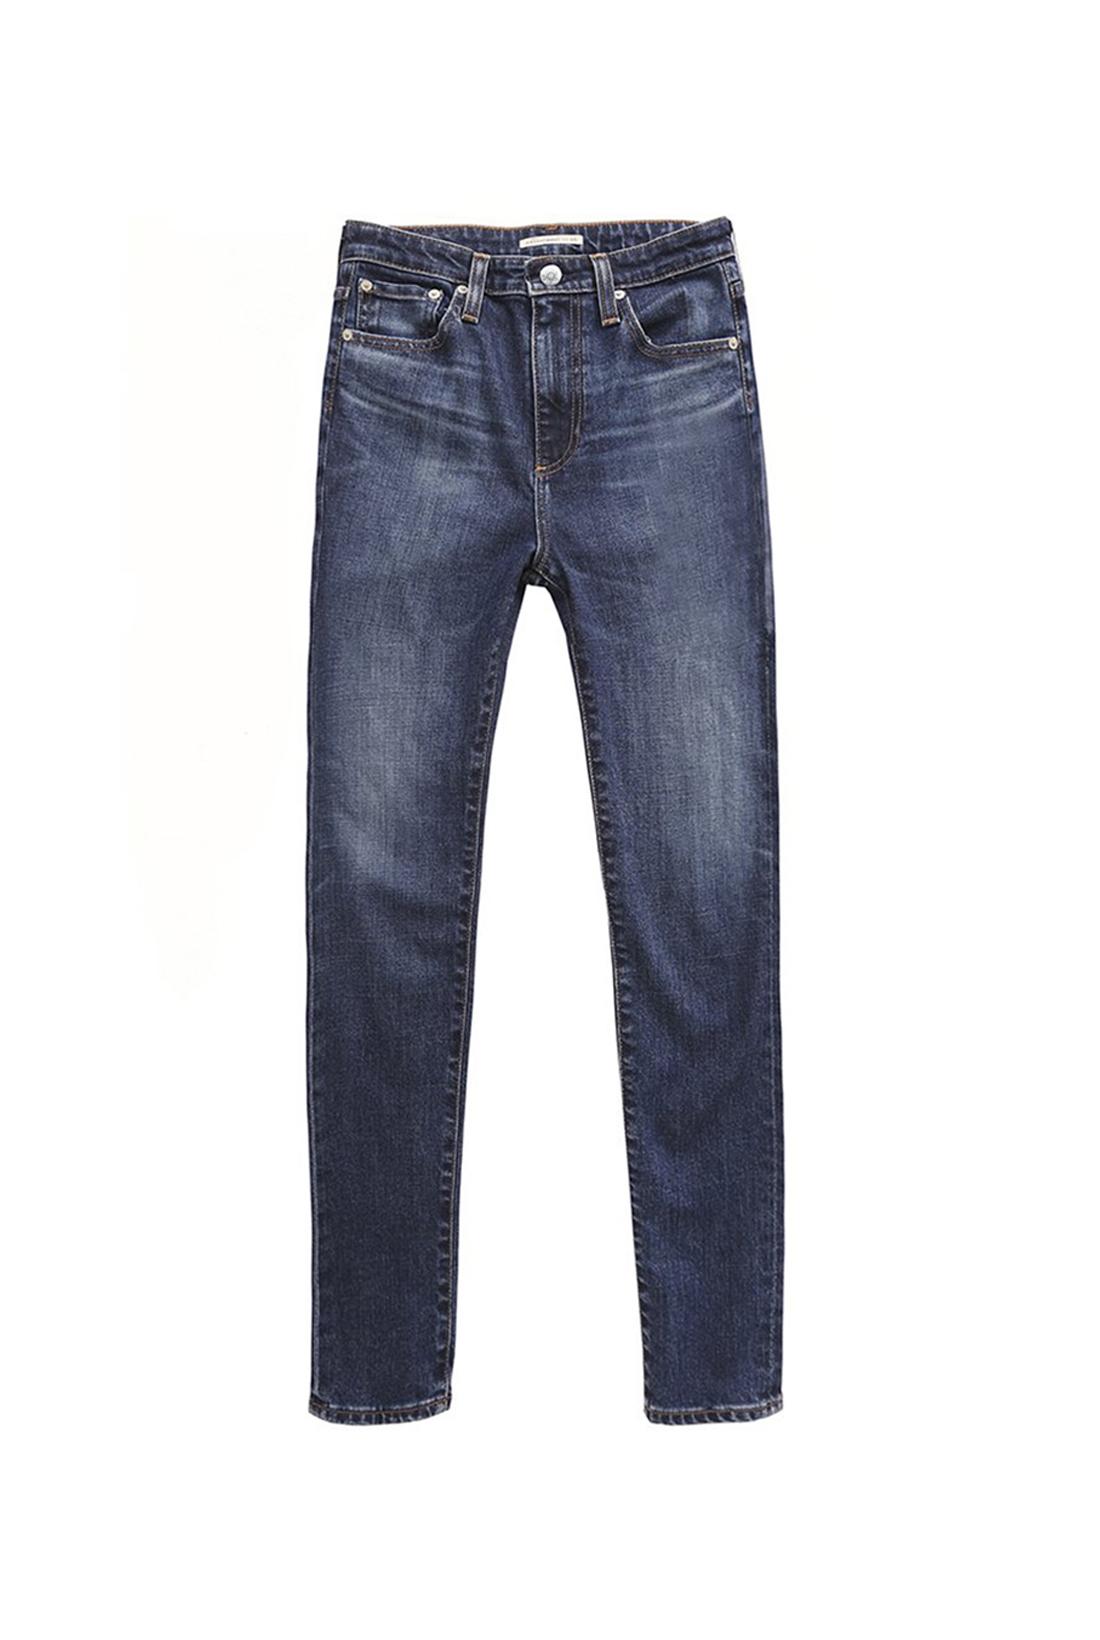 09-spring-denim-trends-high-waisted-skinnies-02.jpg